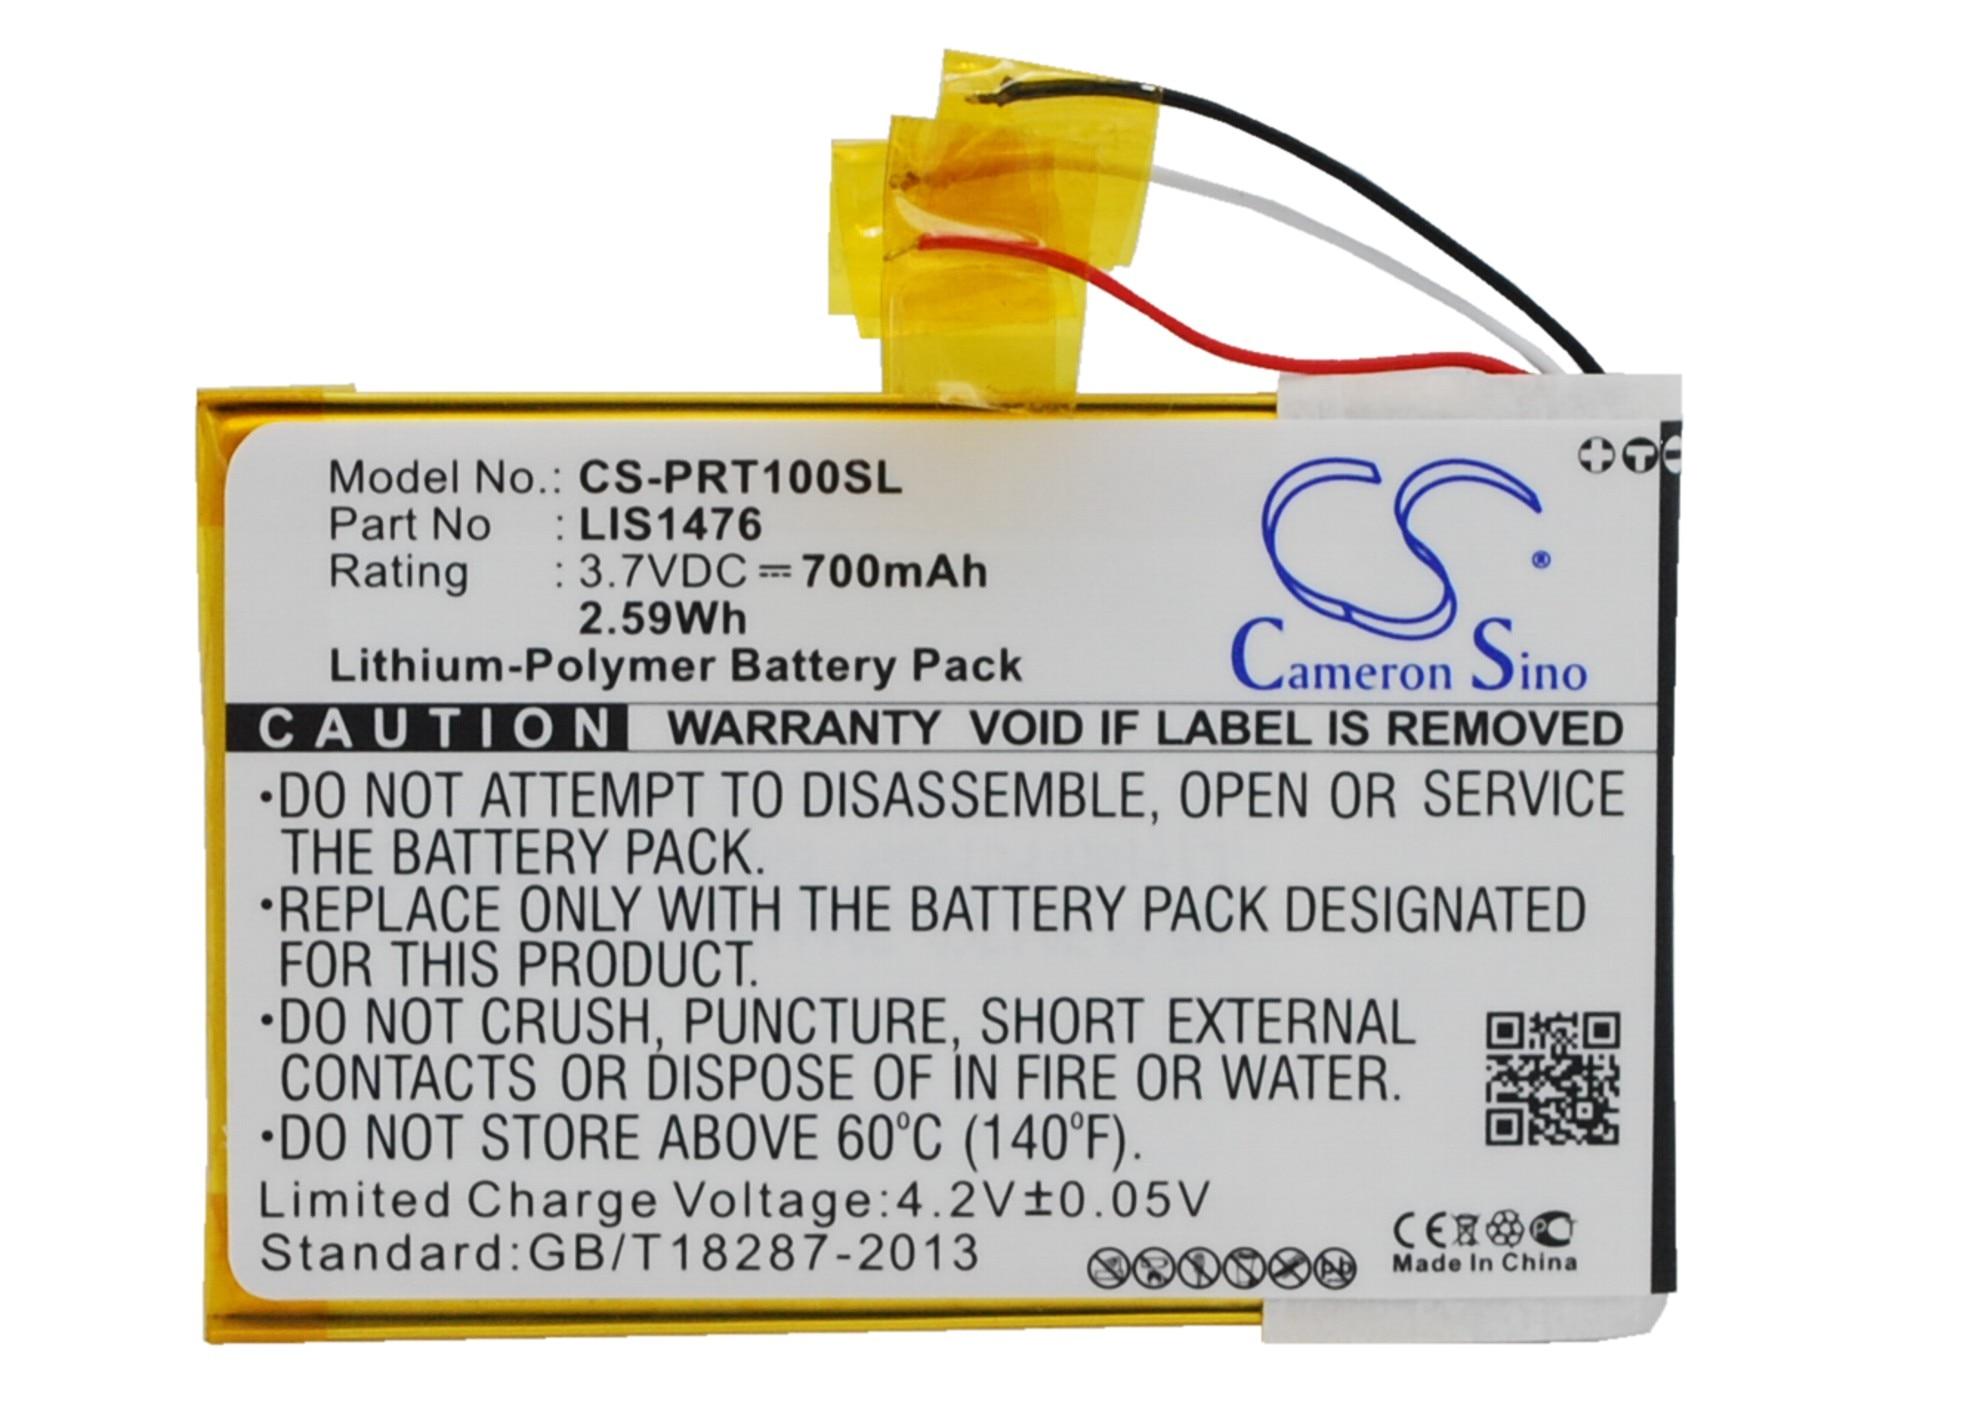 Cameron Sino 700 mAh batterie 1-853-104-11, LIS1476, LIS1476MHPPC (SY6) pour Sony PRS-T1, PRS-T2, PRS-T3, PRS-T3E, PRS-T3SCameron Sino 700 mAh batterie 1-853-104-11, LIS1476, LIS1476MHPPC (SY6) pour Sony PRS-T1, PRS-T2, PRS-T3, PRS-T3E, PRS-T3S